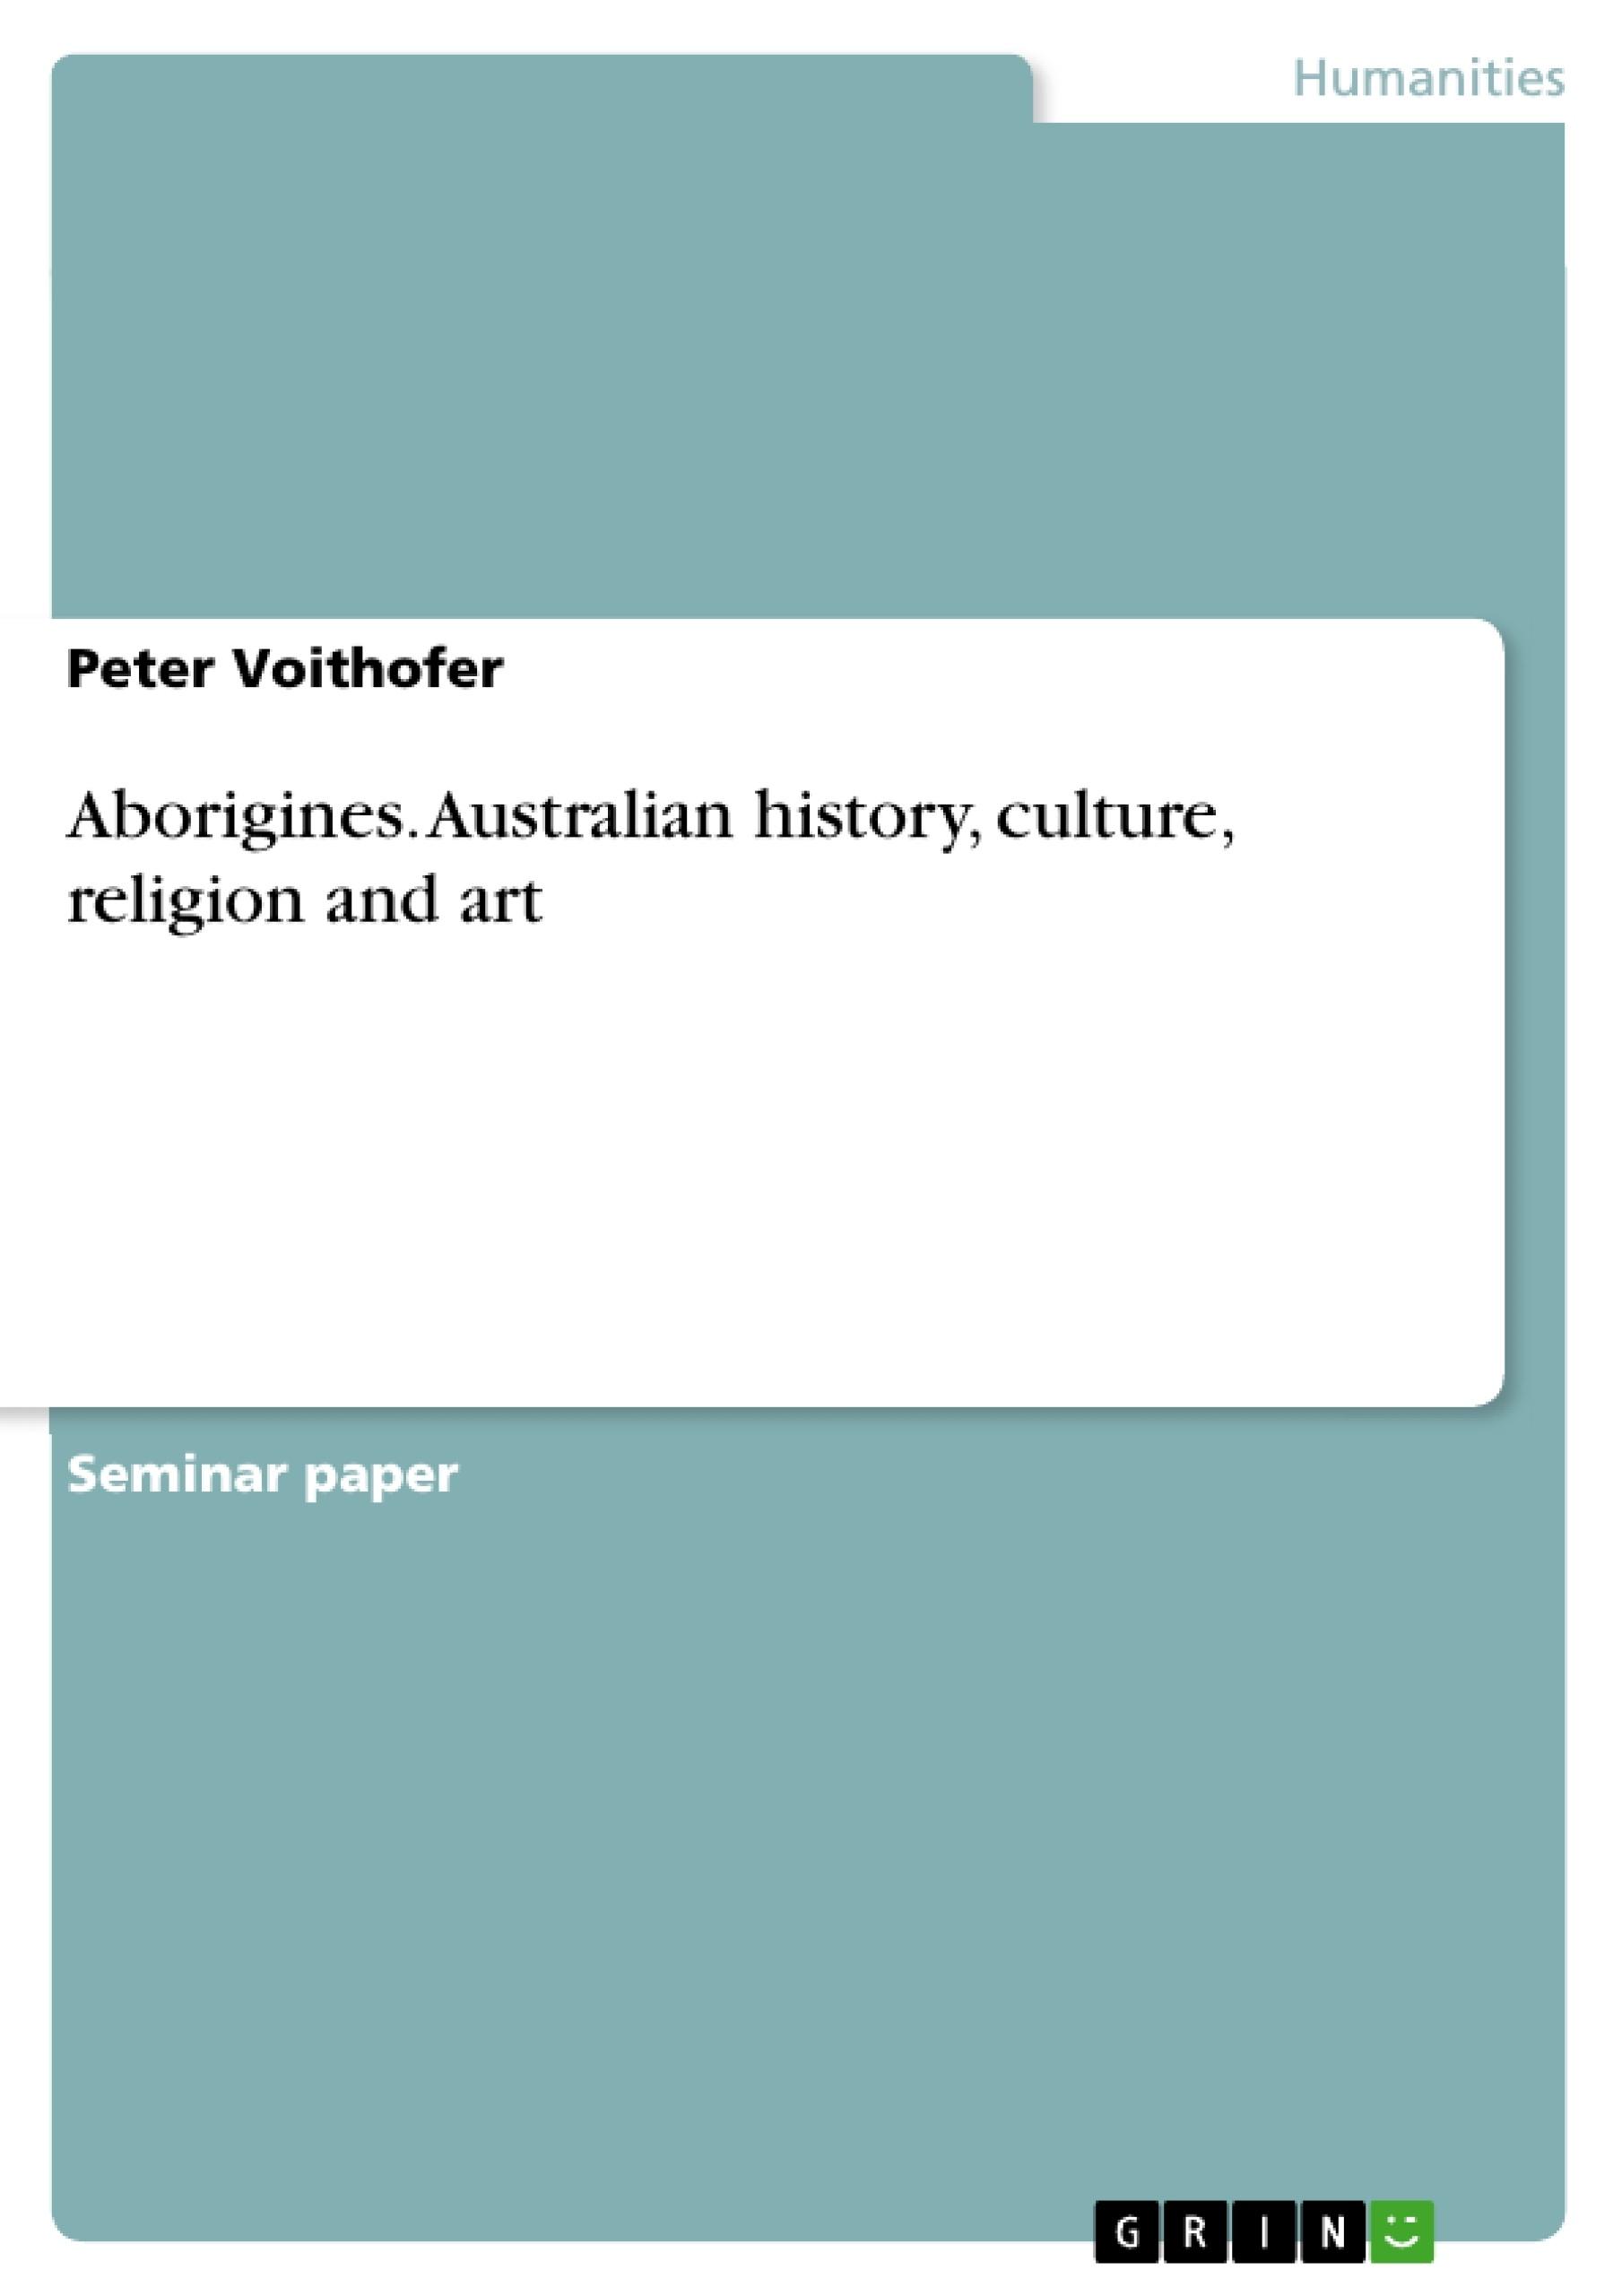 Title: Aborigines. Australian history, culture, religion and art